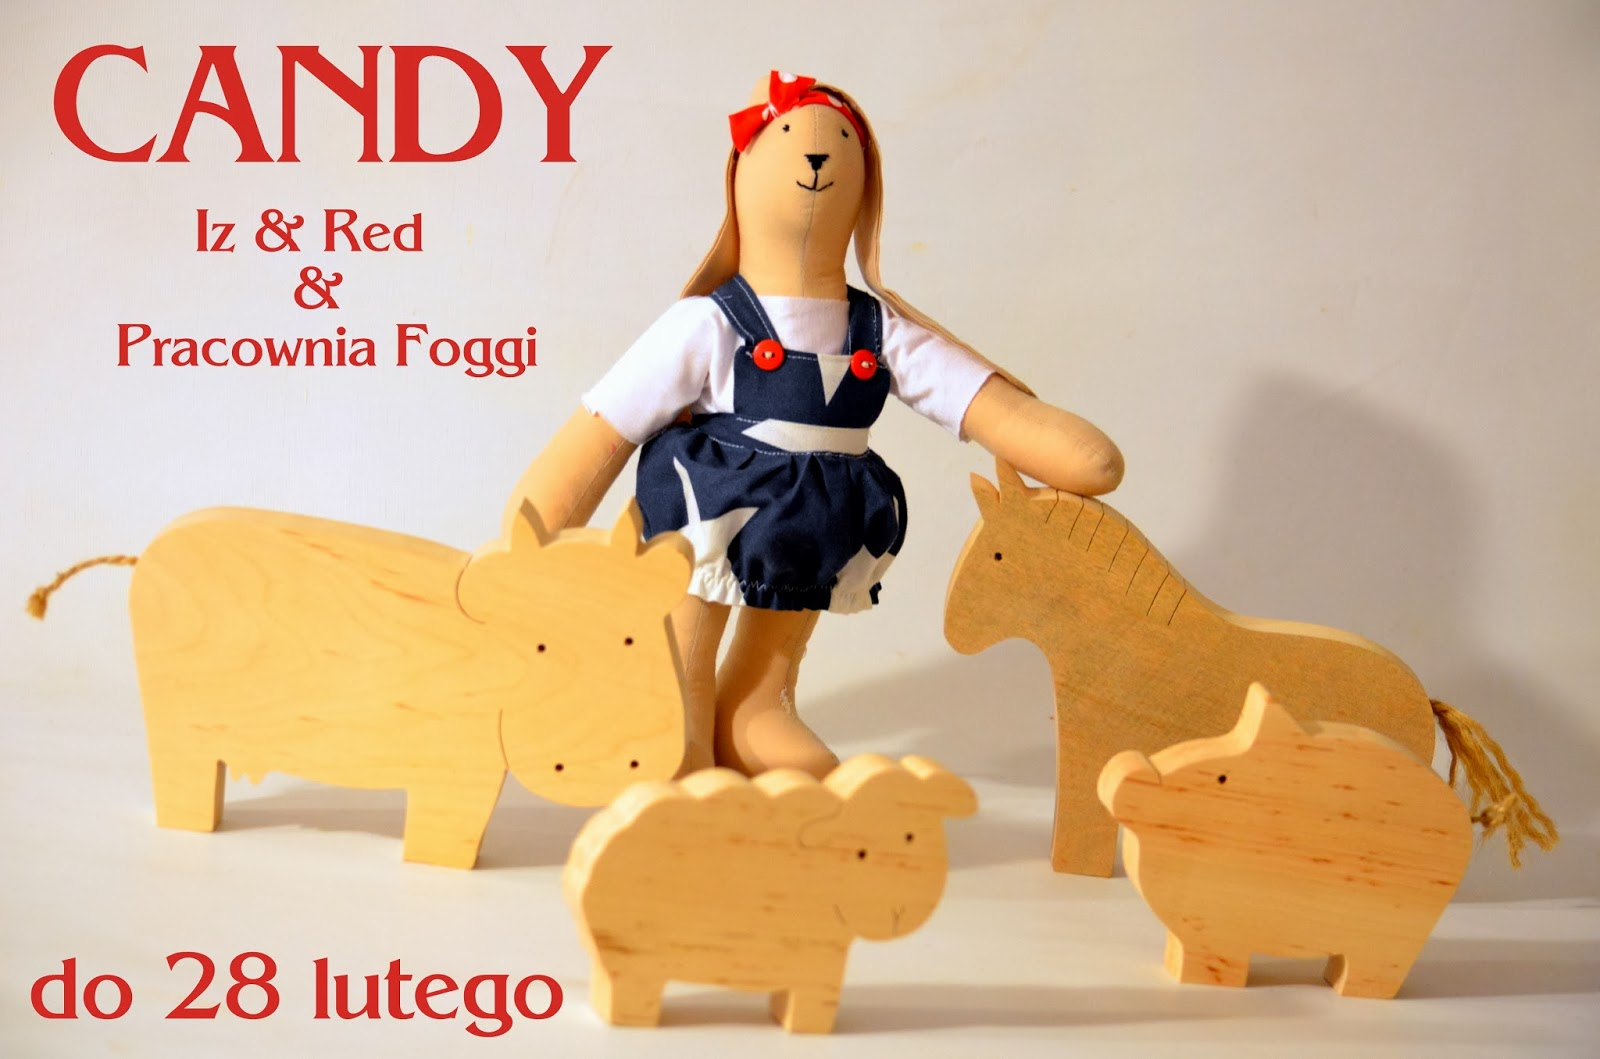 Candy  Iz & Red & Pracownia Foggi